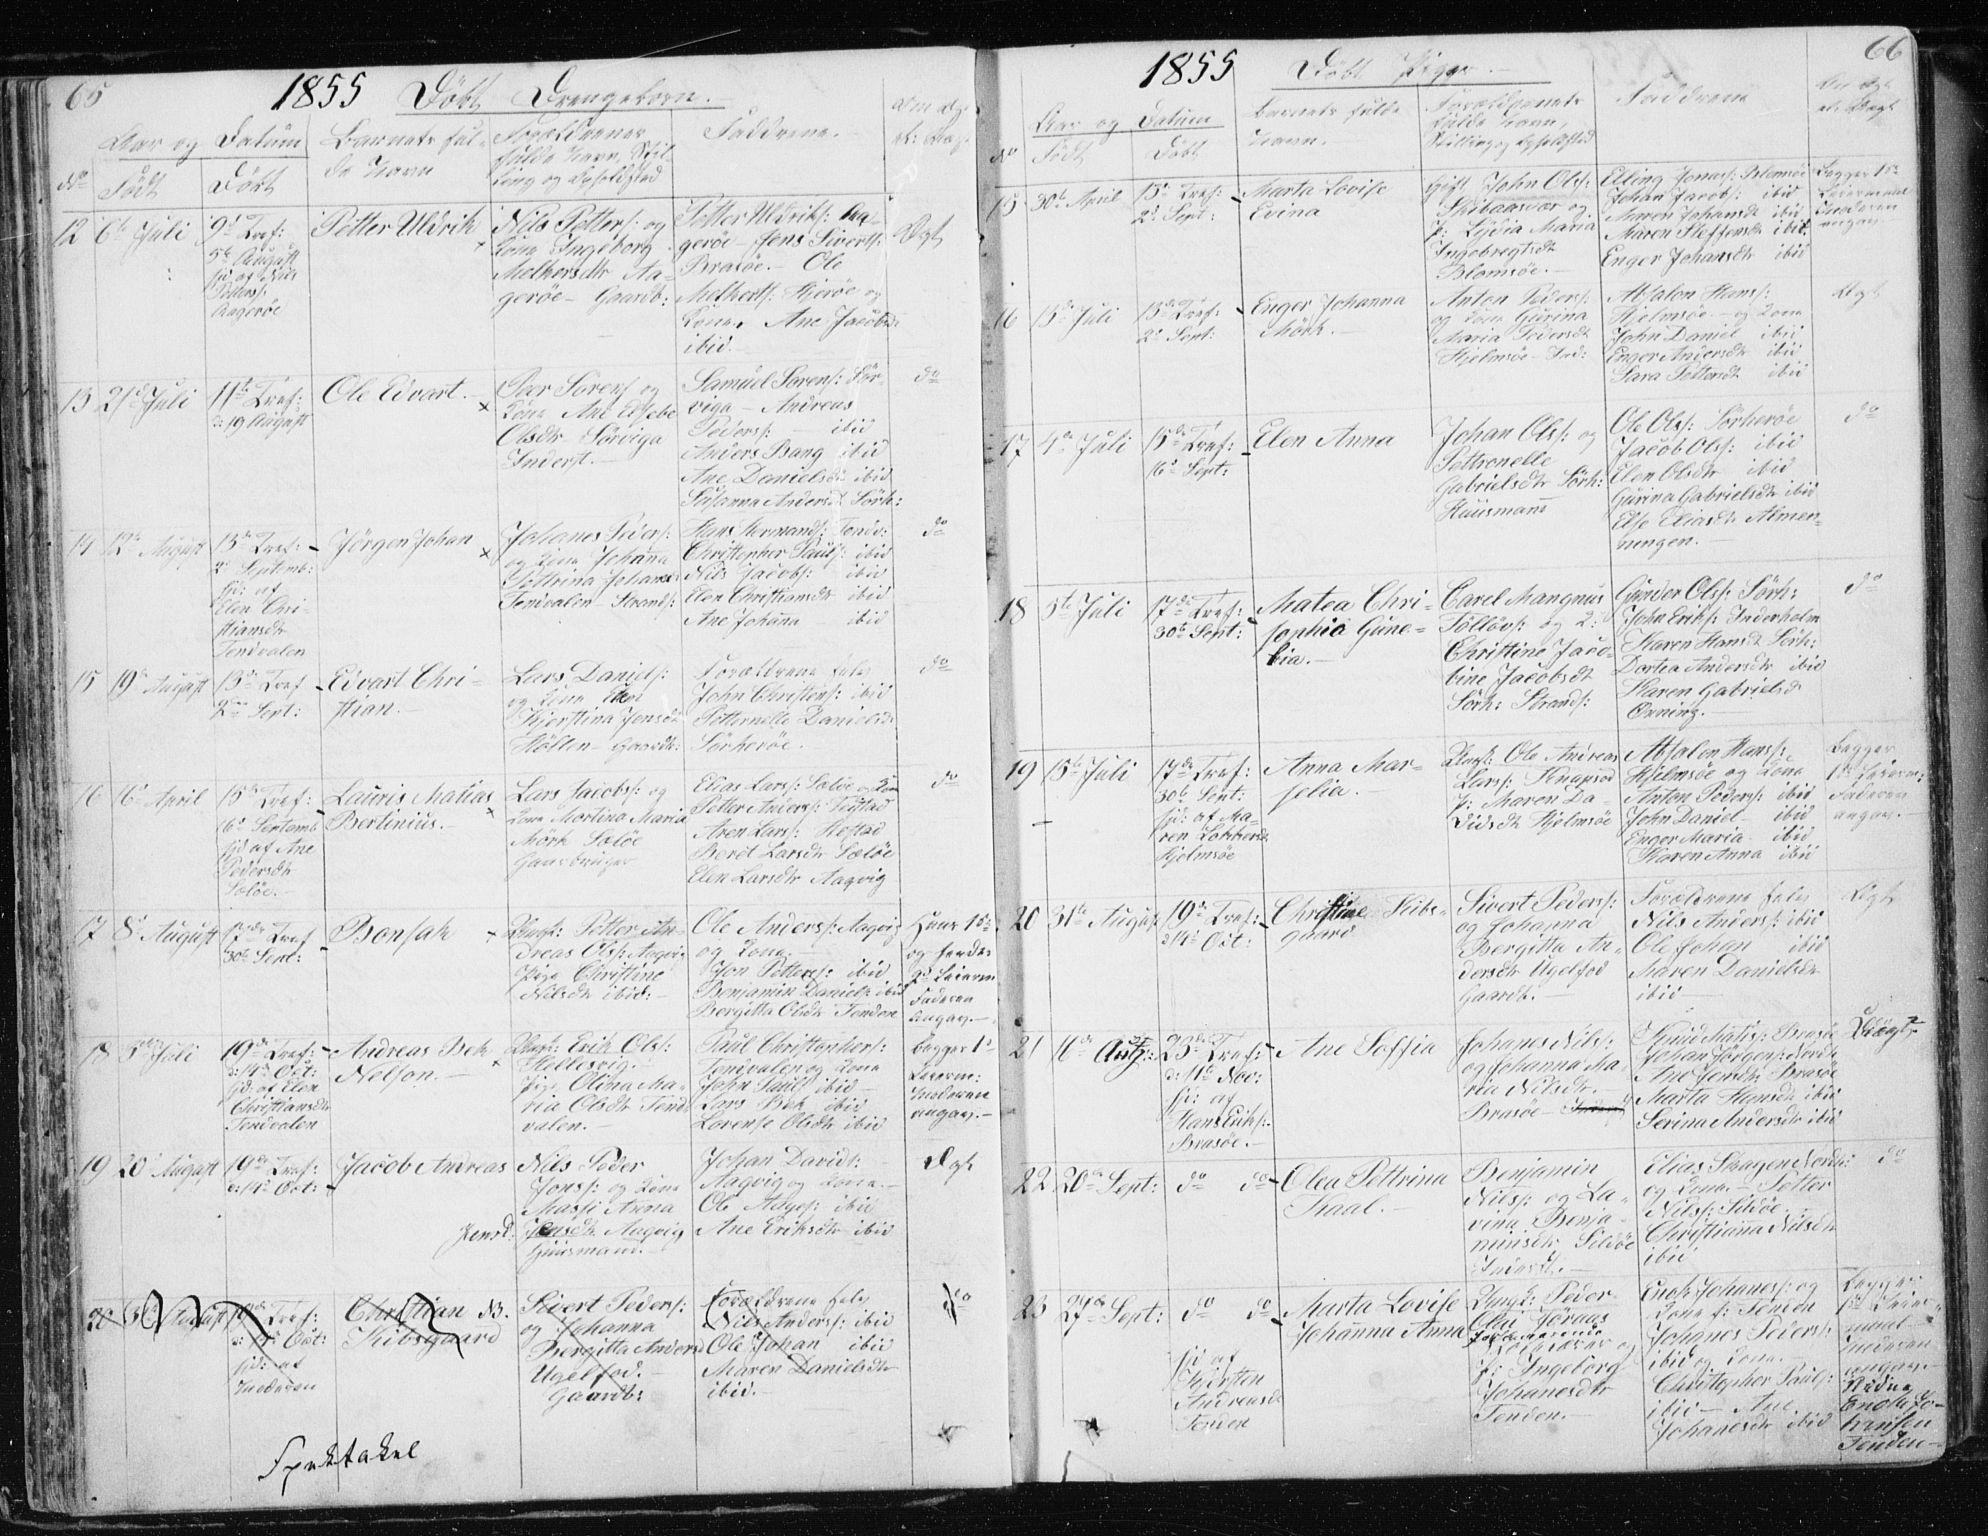 SAT, Ministerialprotokoller, klokkerbøker og fødselsregistre - Nordland, 834/L0511: Klokkerbok nr. 834C02, 1848-1862, s. 65-66